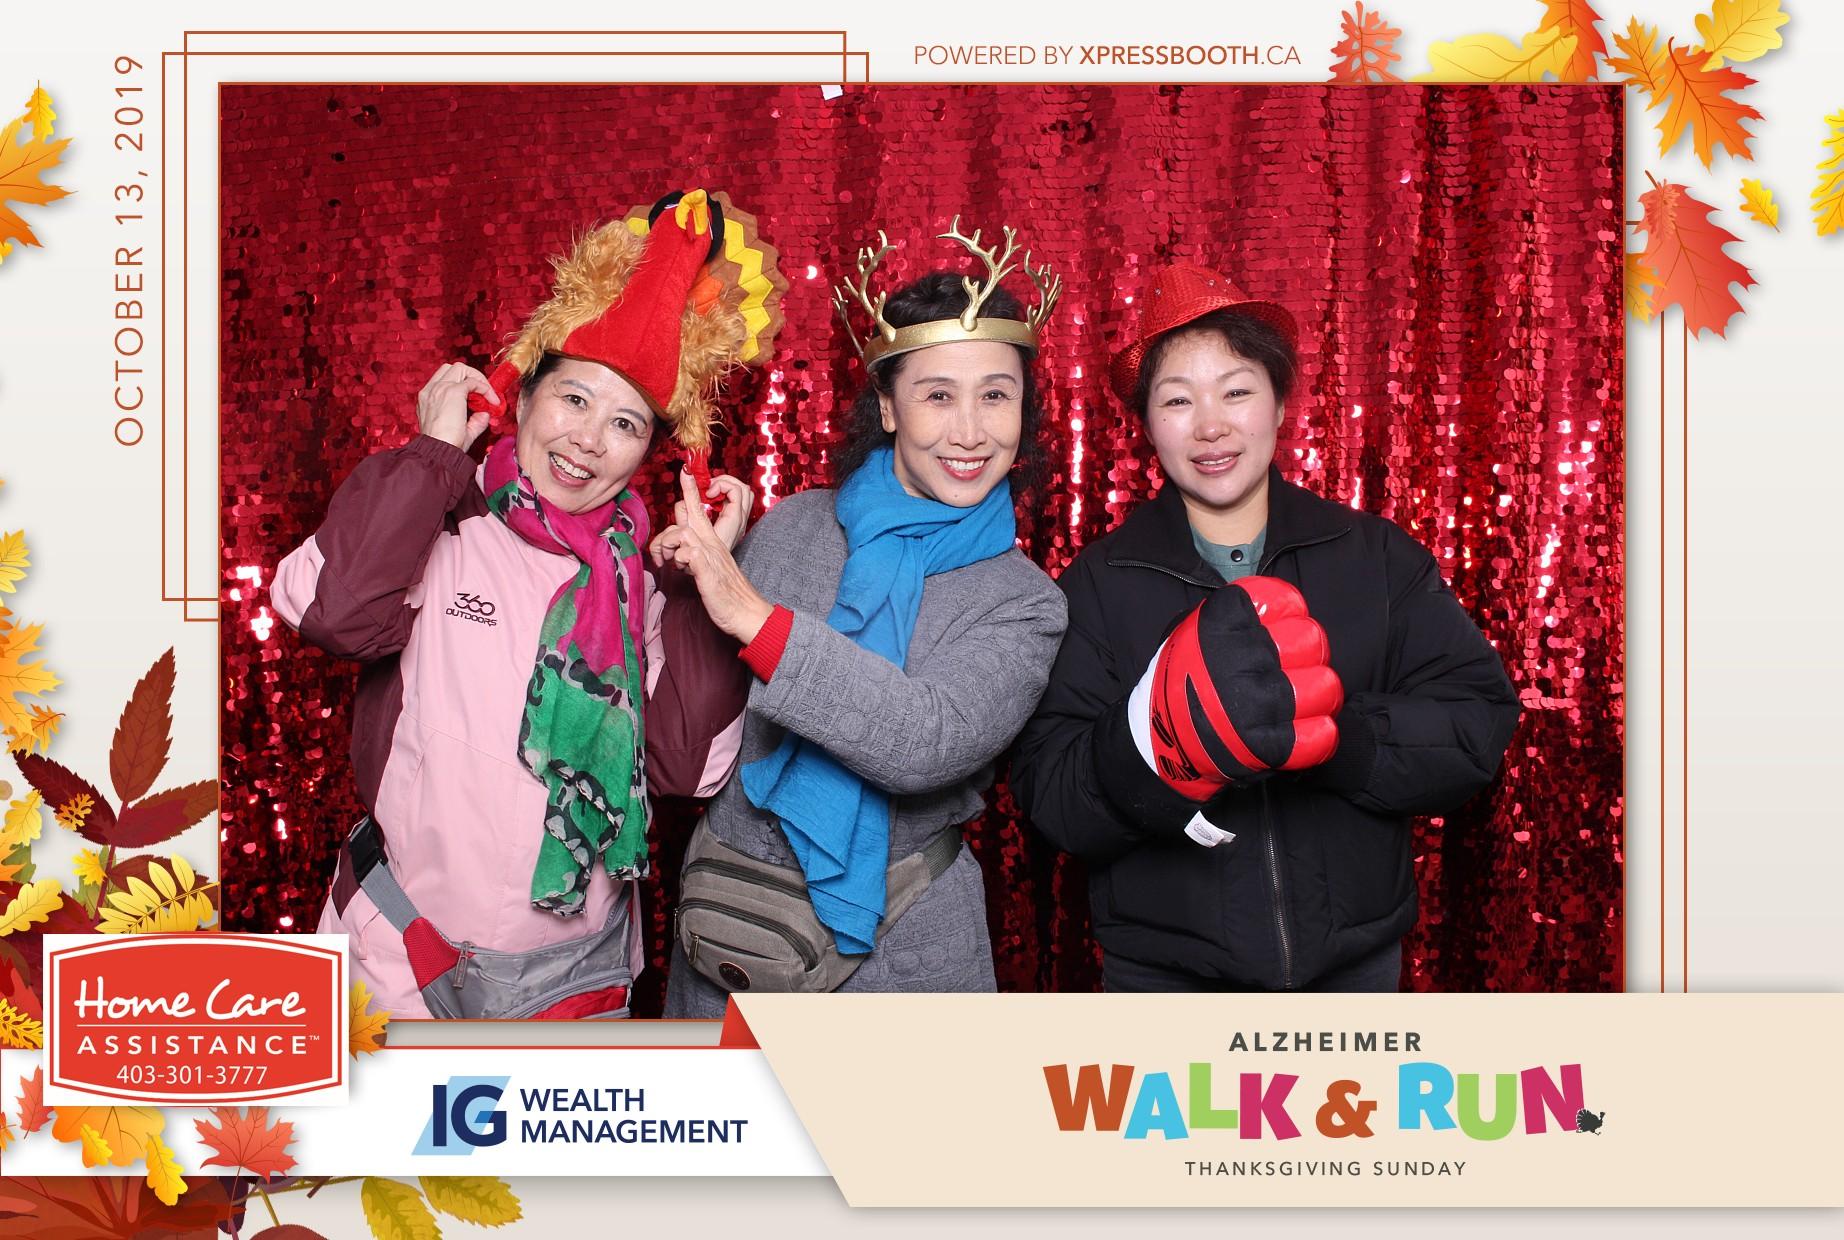 WalkRunAlzheimerSociety-0186-PRINT